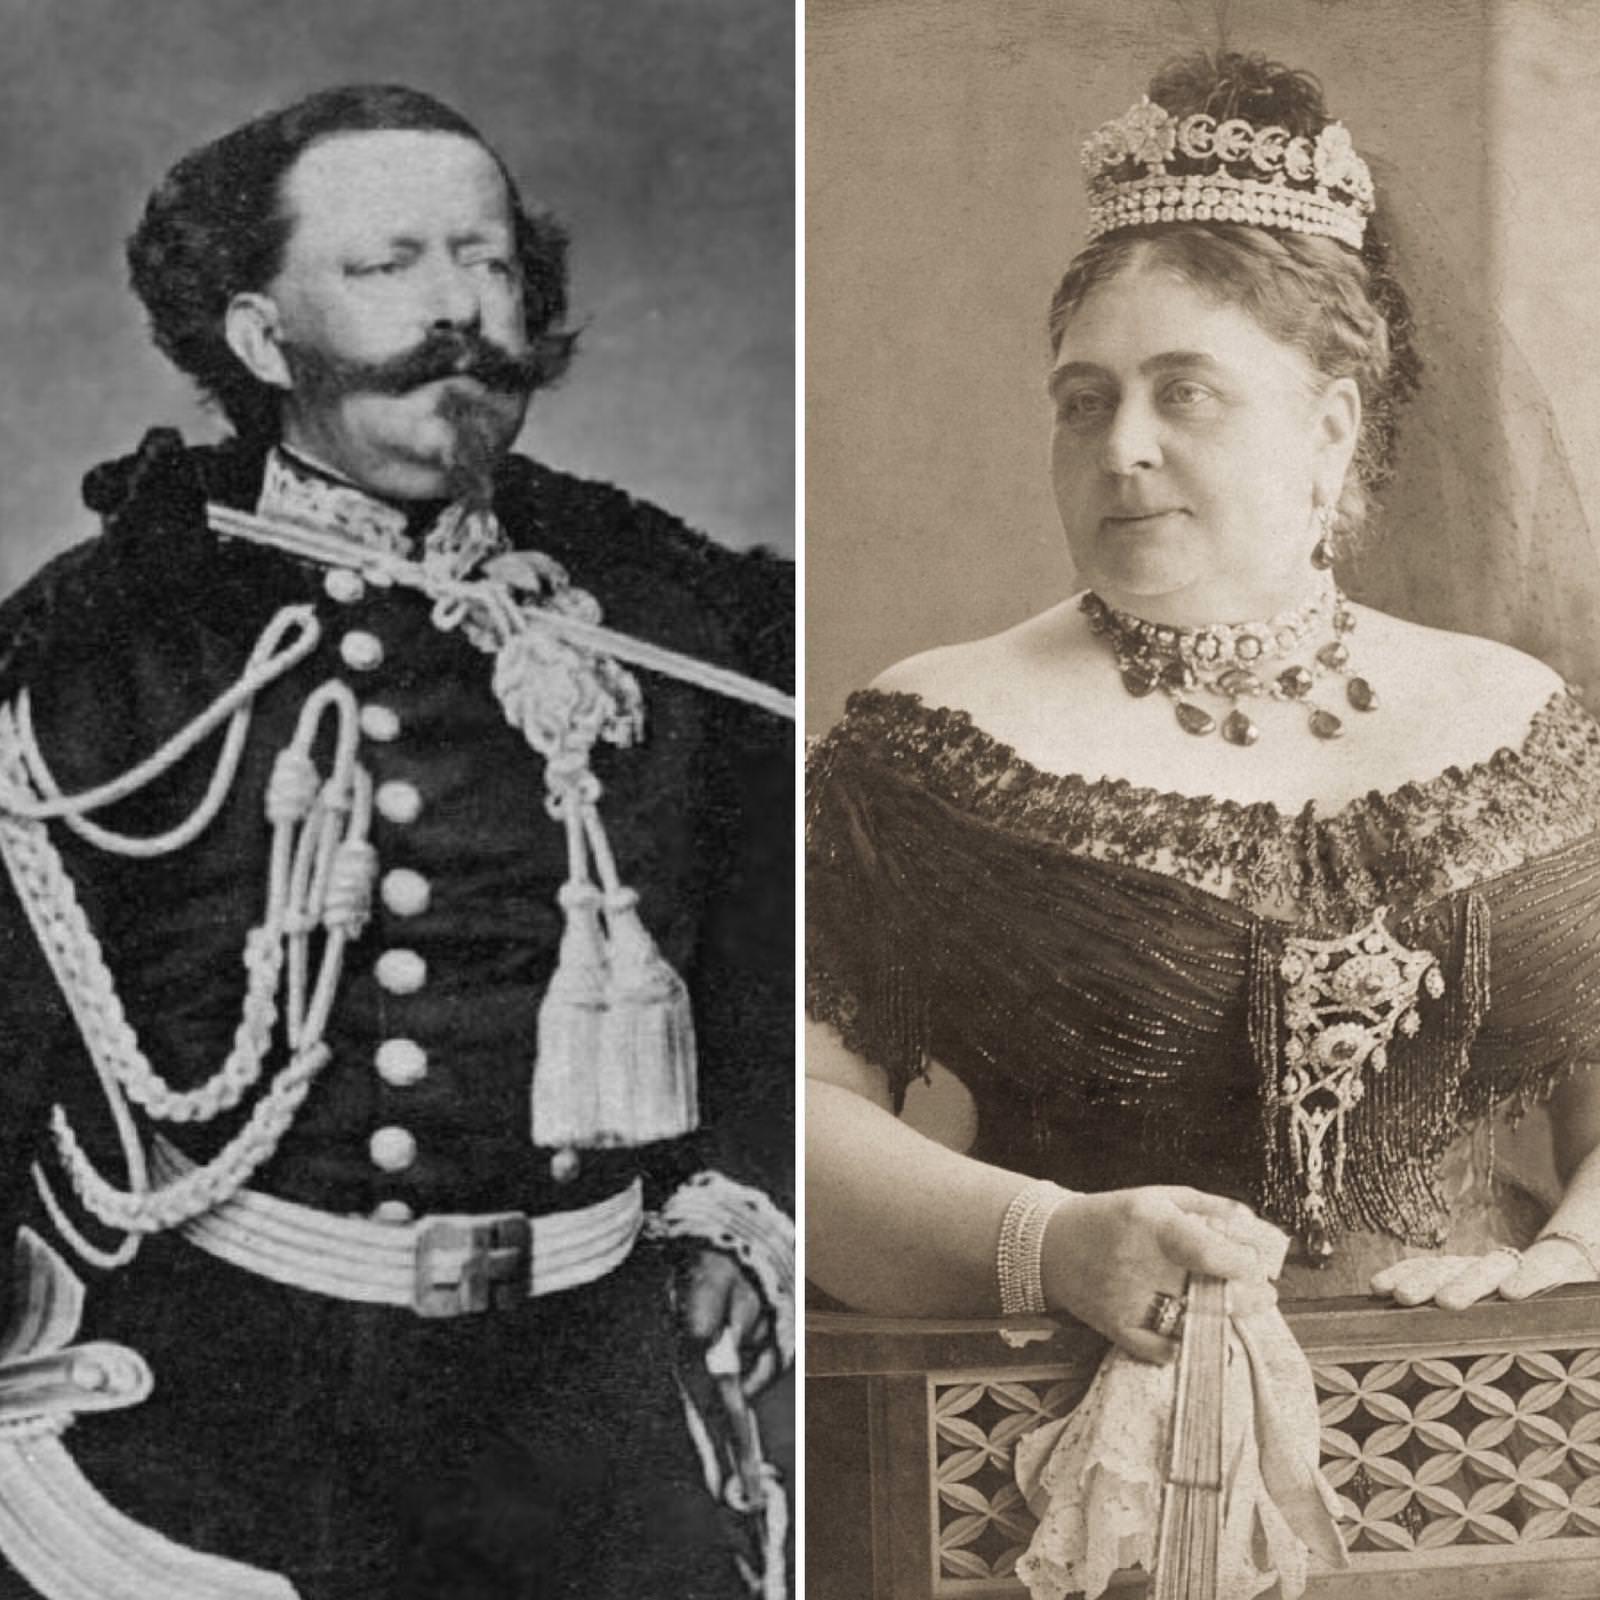 Promessi Sposi, ovvero i matrimoni impossibili fra i Savoia